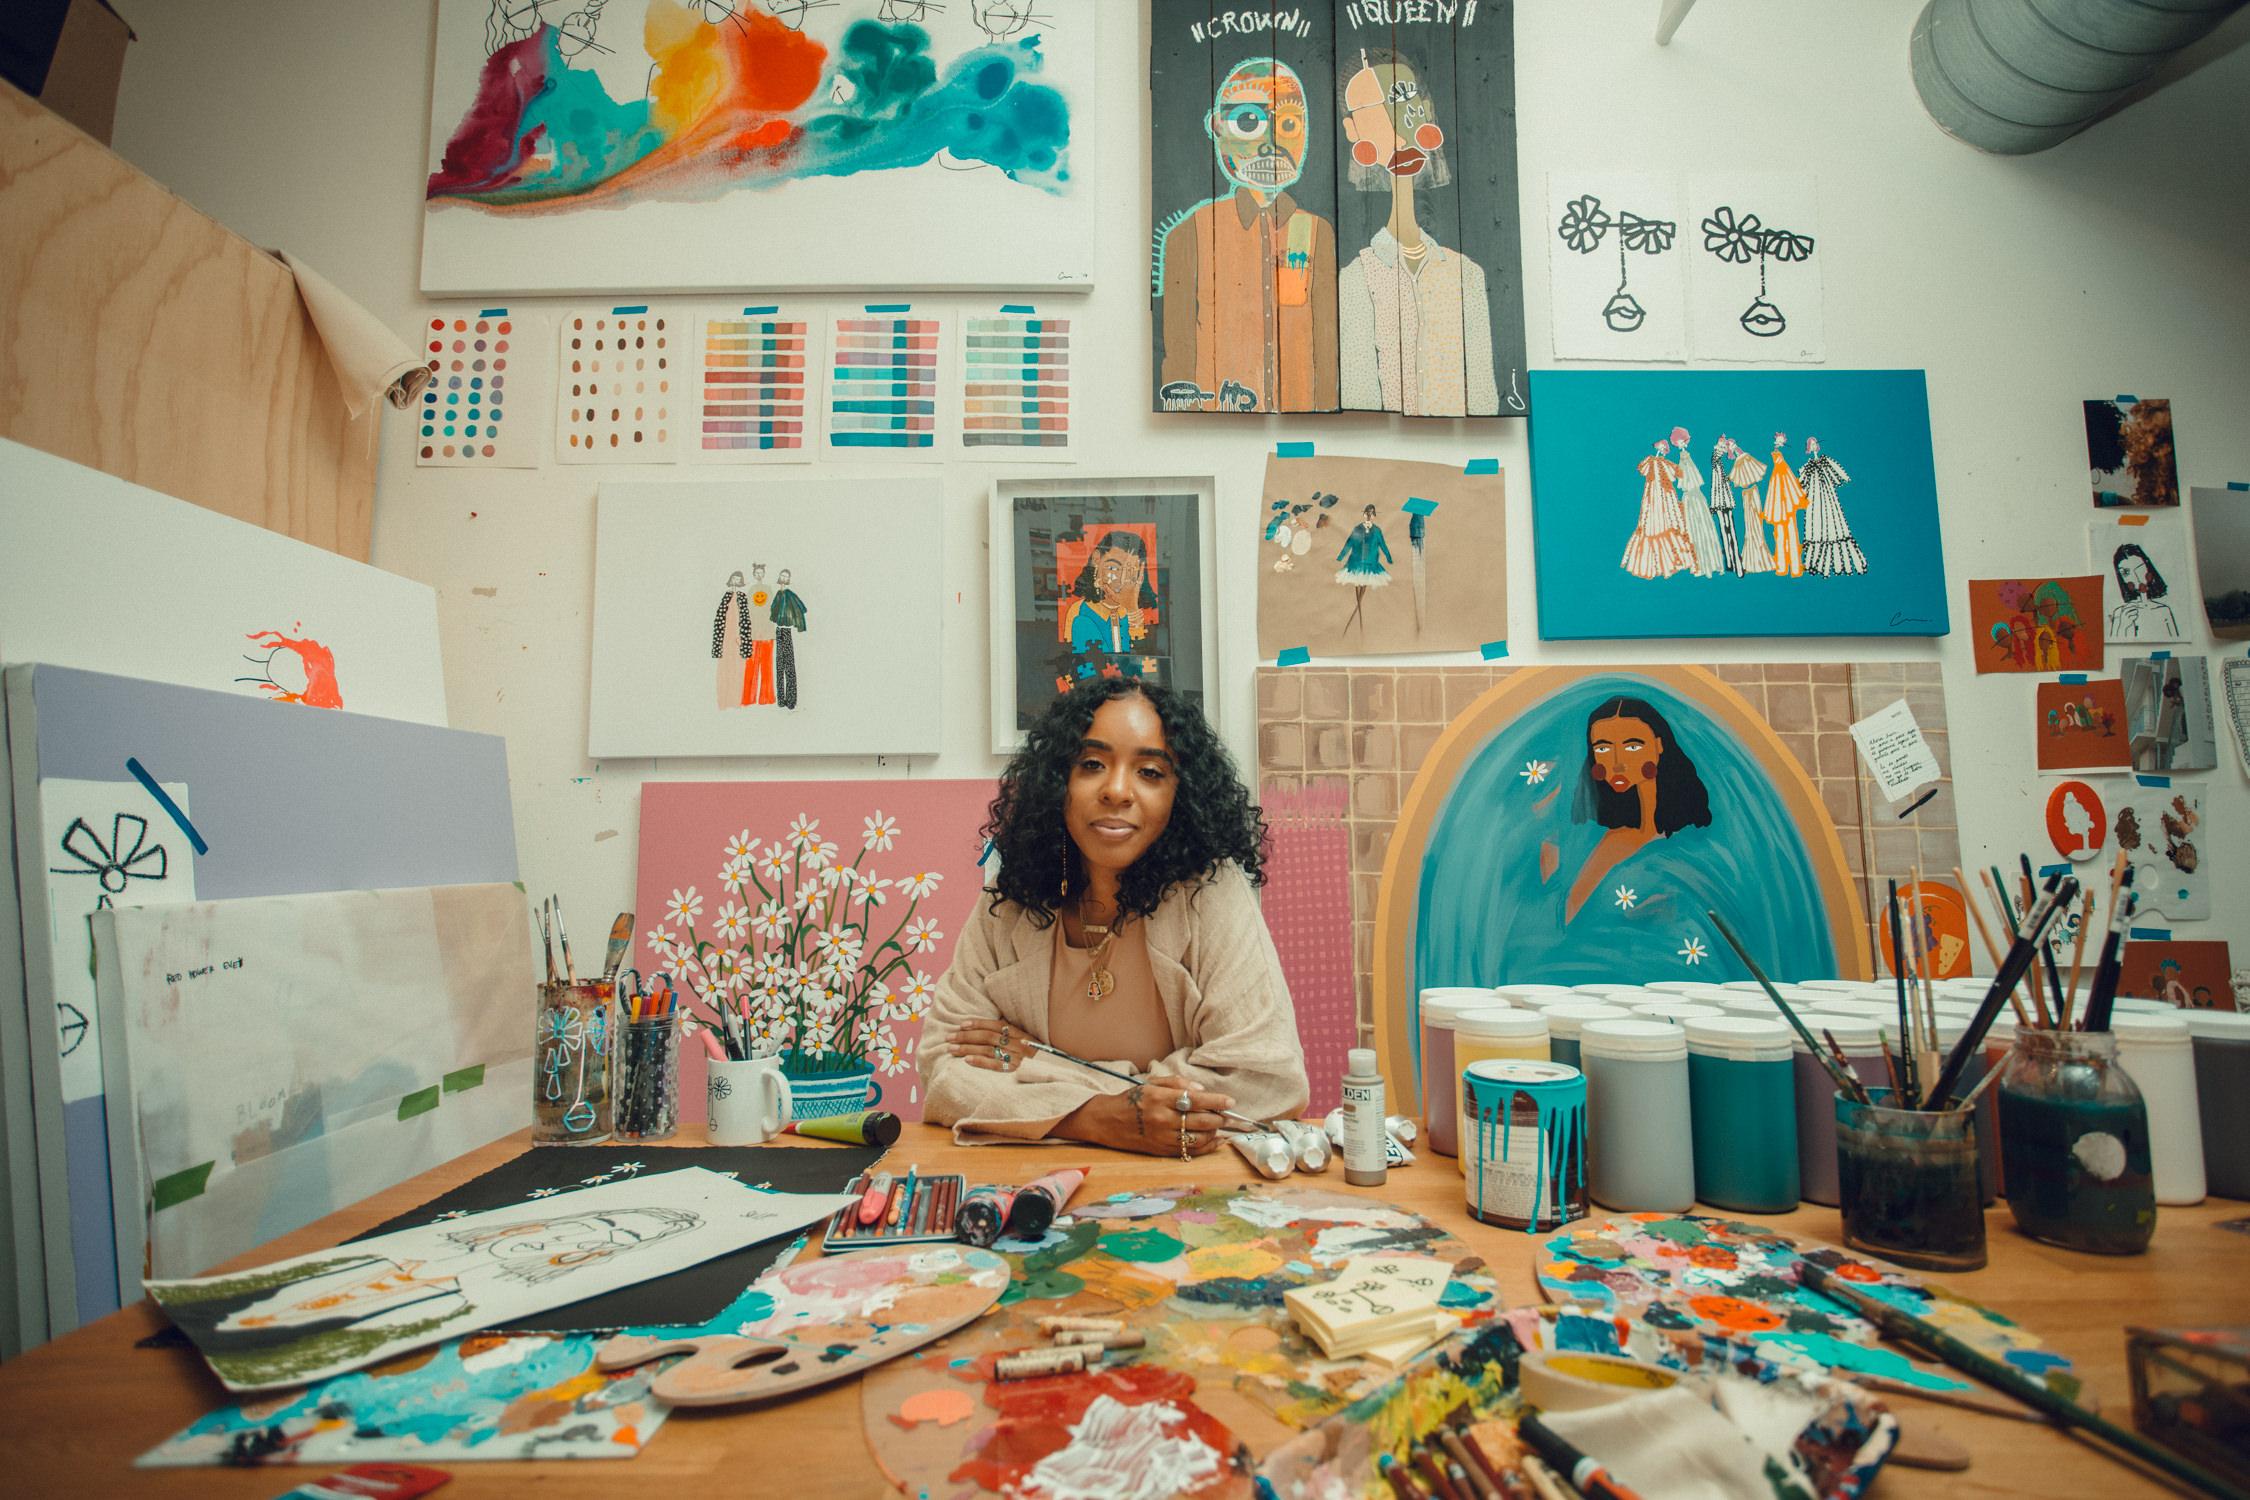 Cristina Martinez with her artwork